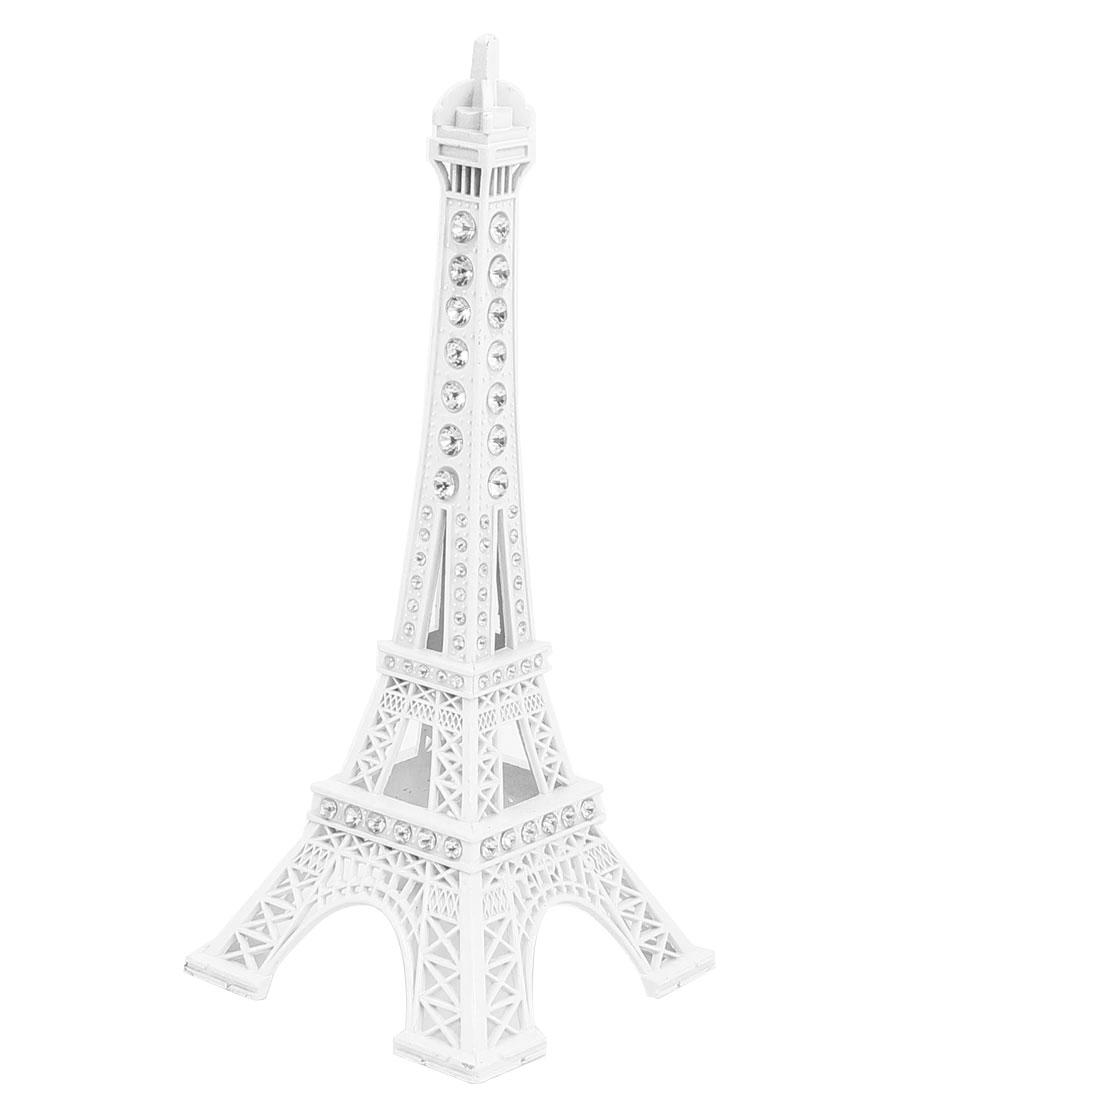 "Rhinestone Decor Mini France Paris Eiffel Tower Sculpture Statue Model Desk Ornament 7"" 18cm White"